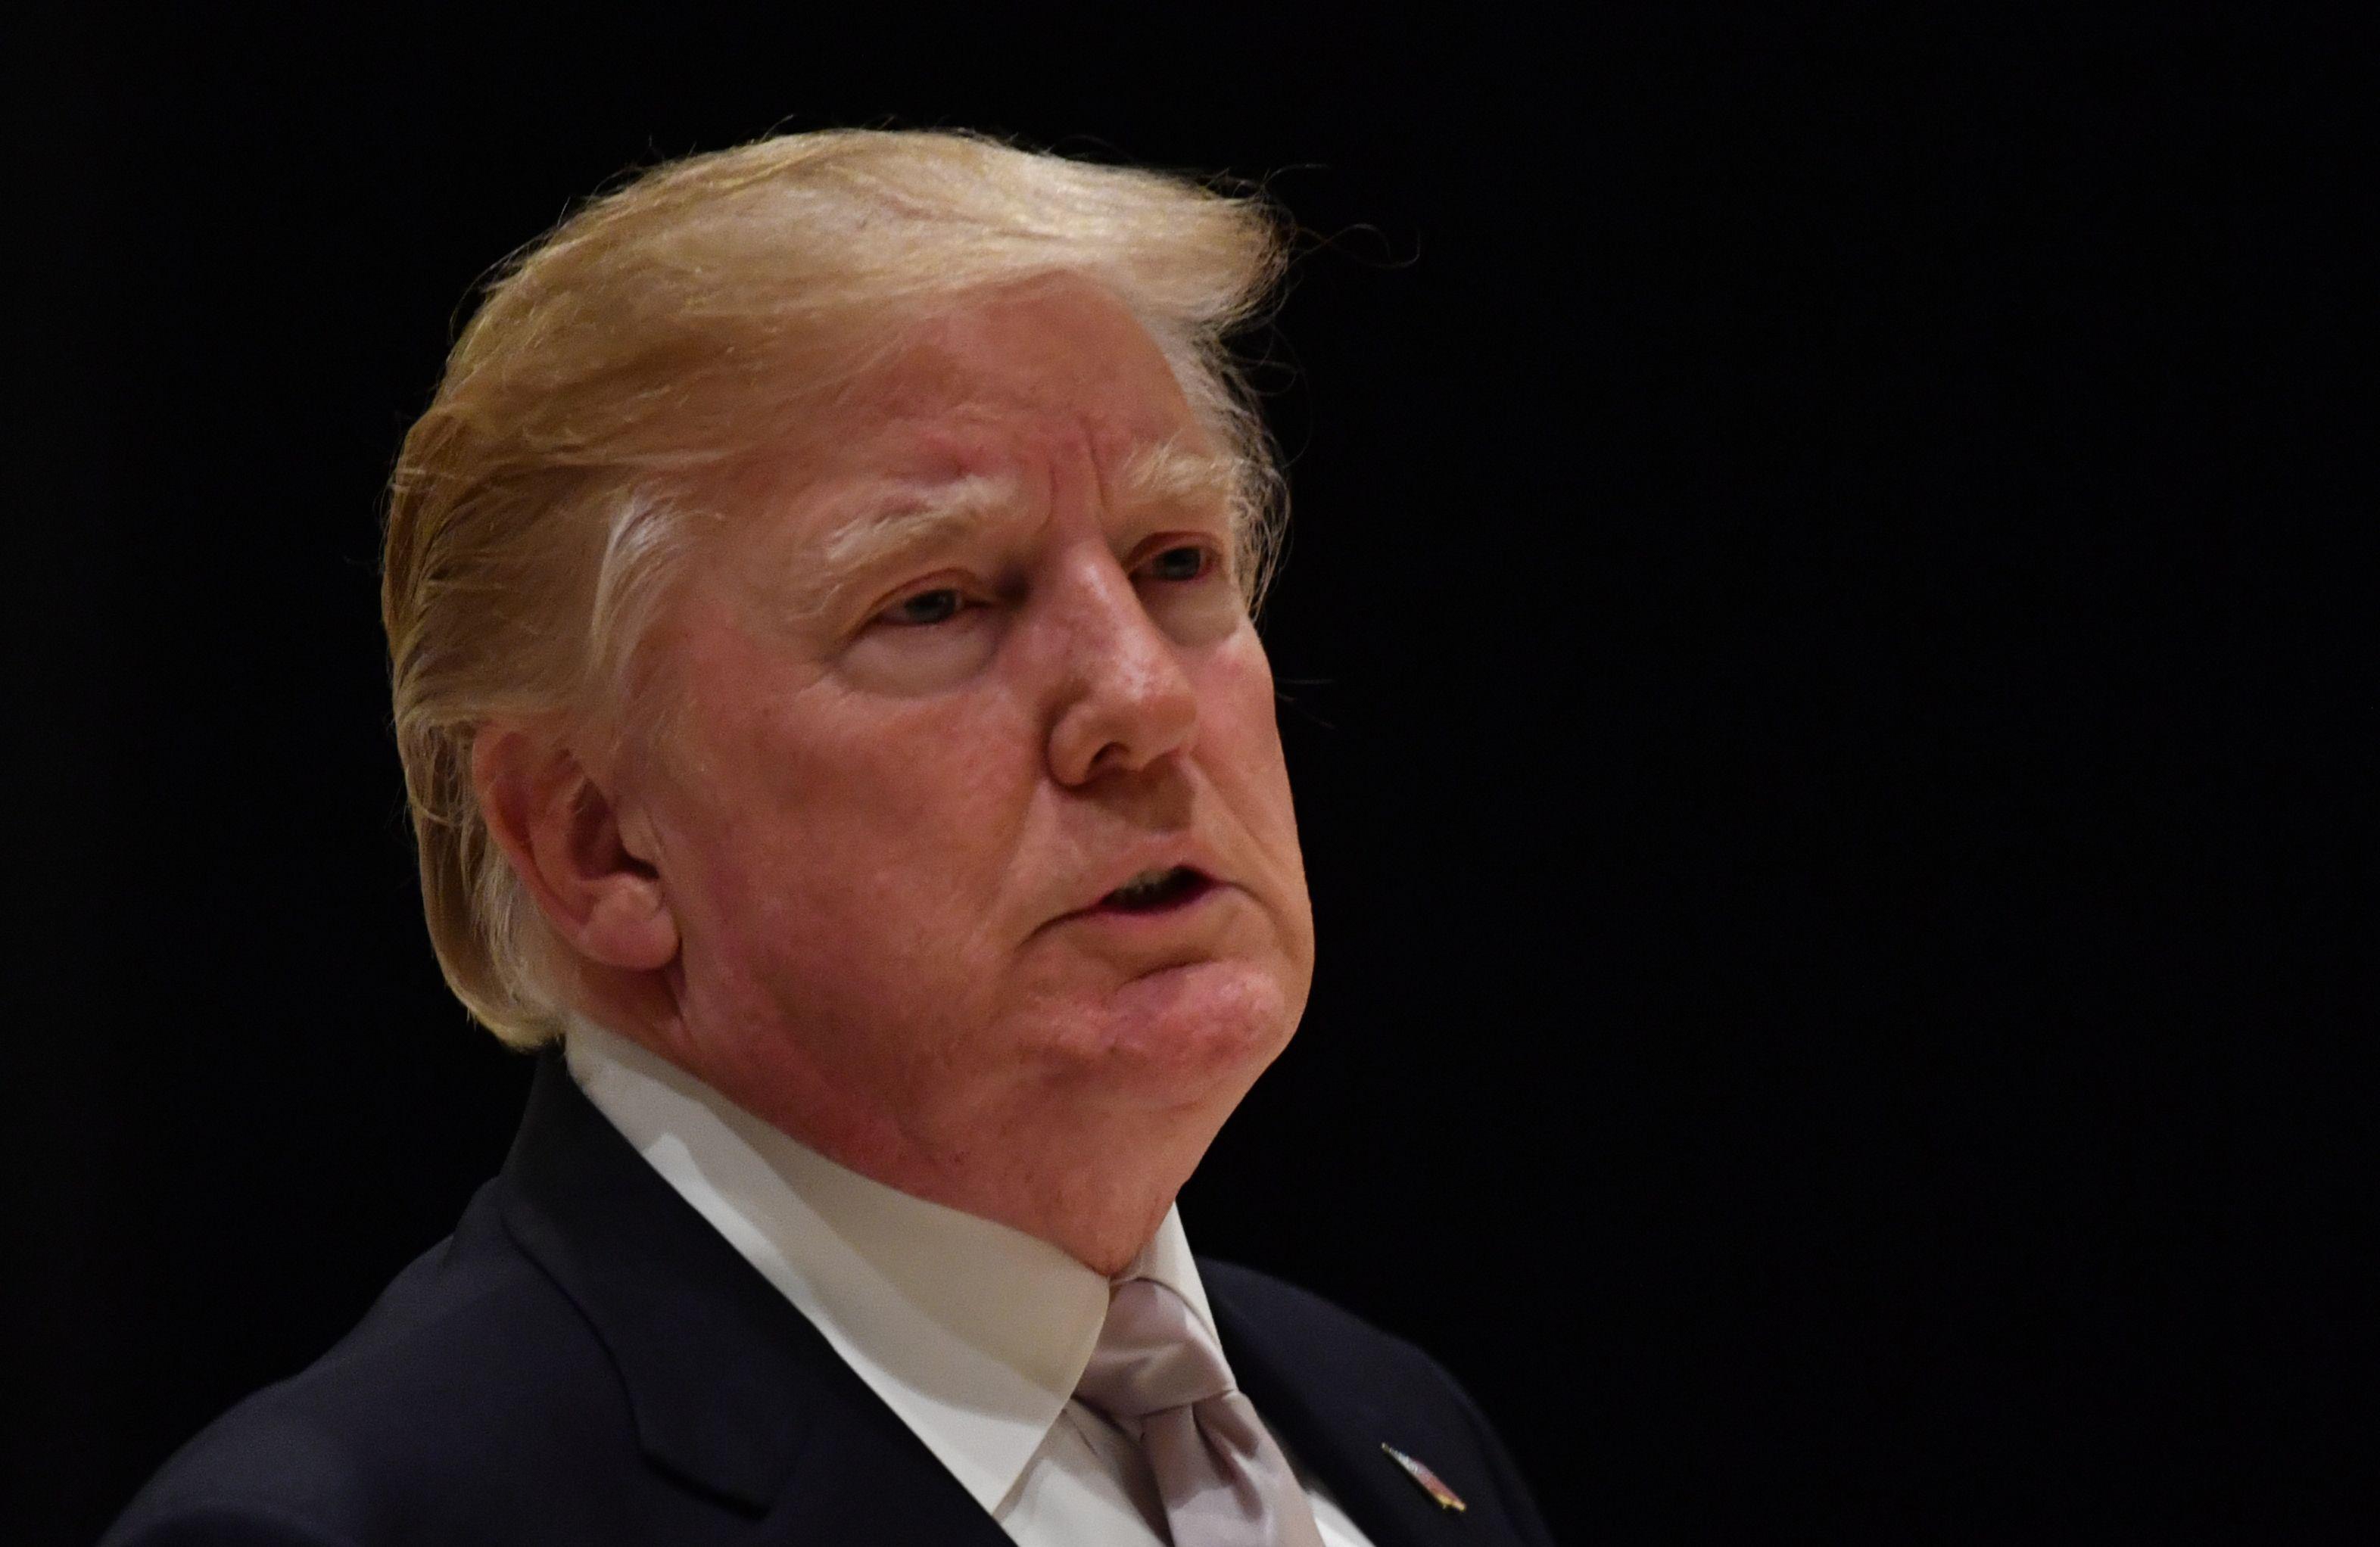 Headshot of Donald Trump.